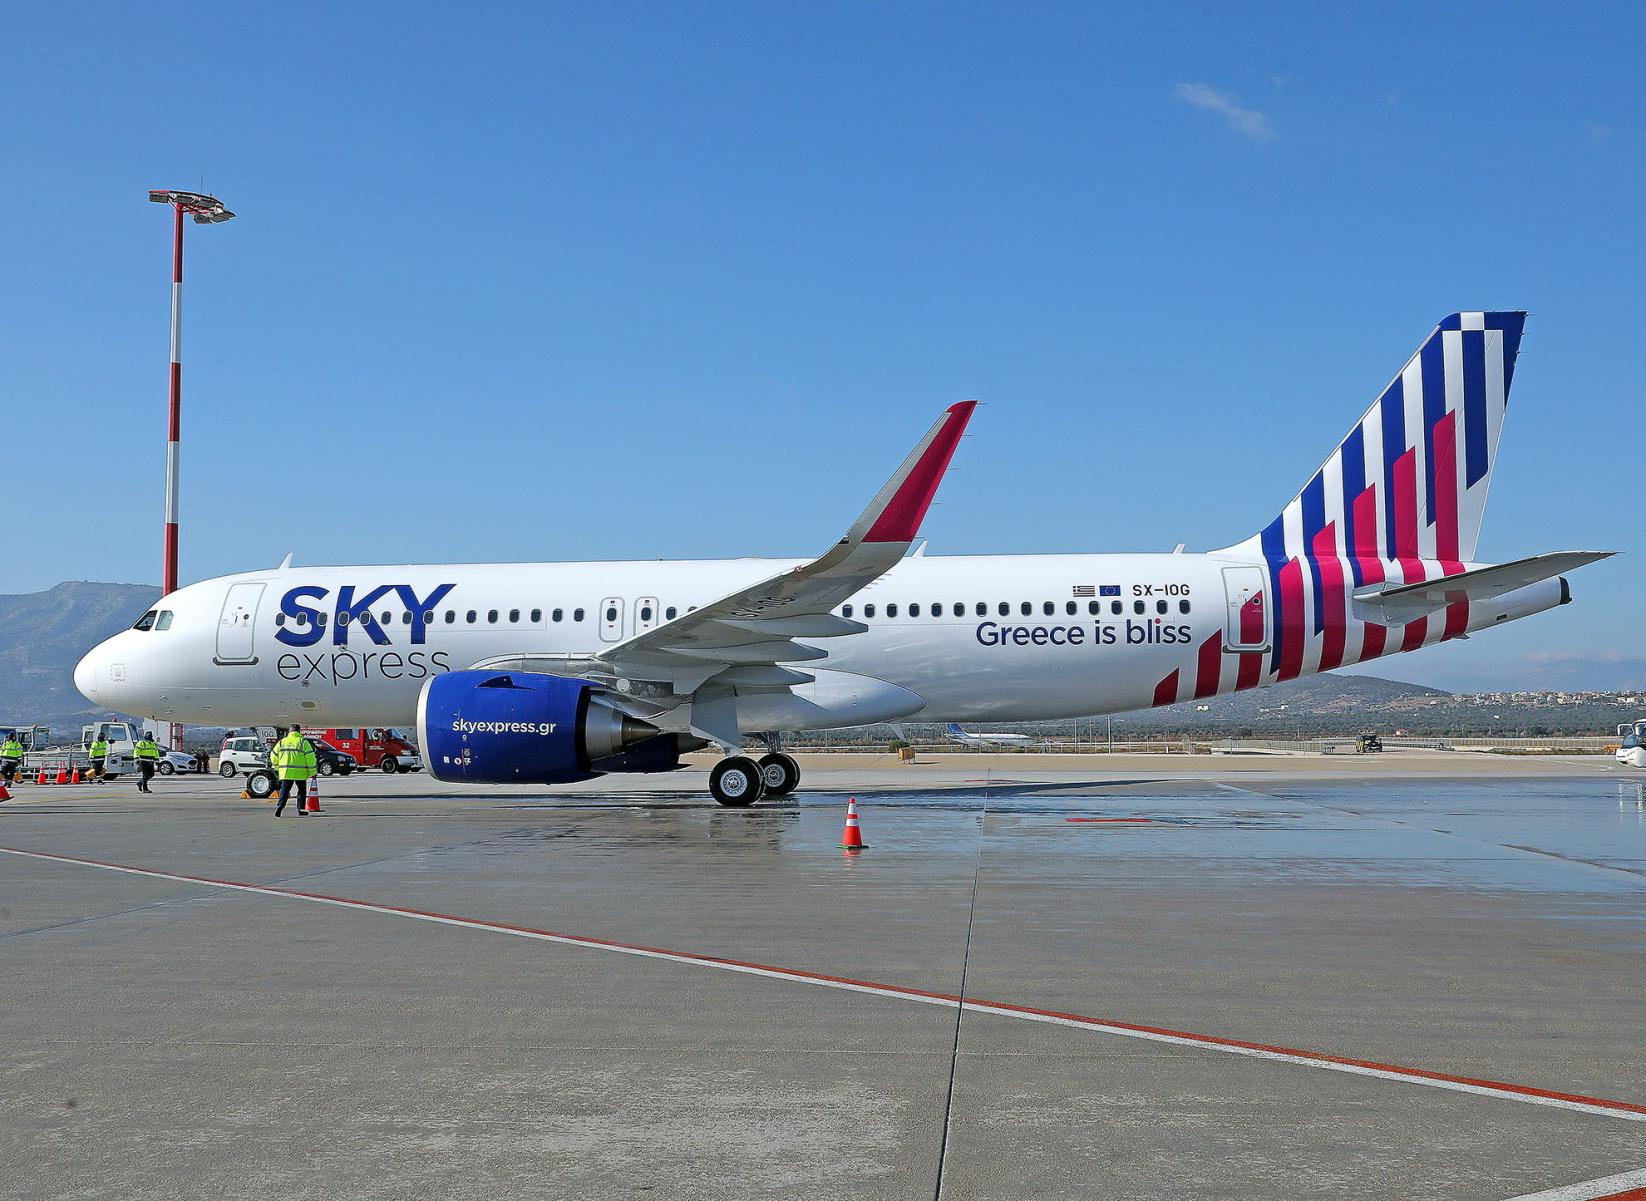 SKYexpress: Ποιες πτήσεις ακυρώνονται και ποιες τροποποιούνται αύριο